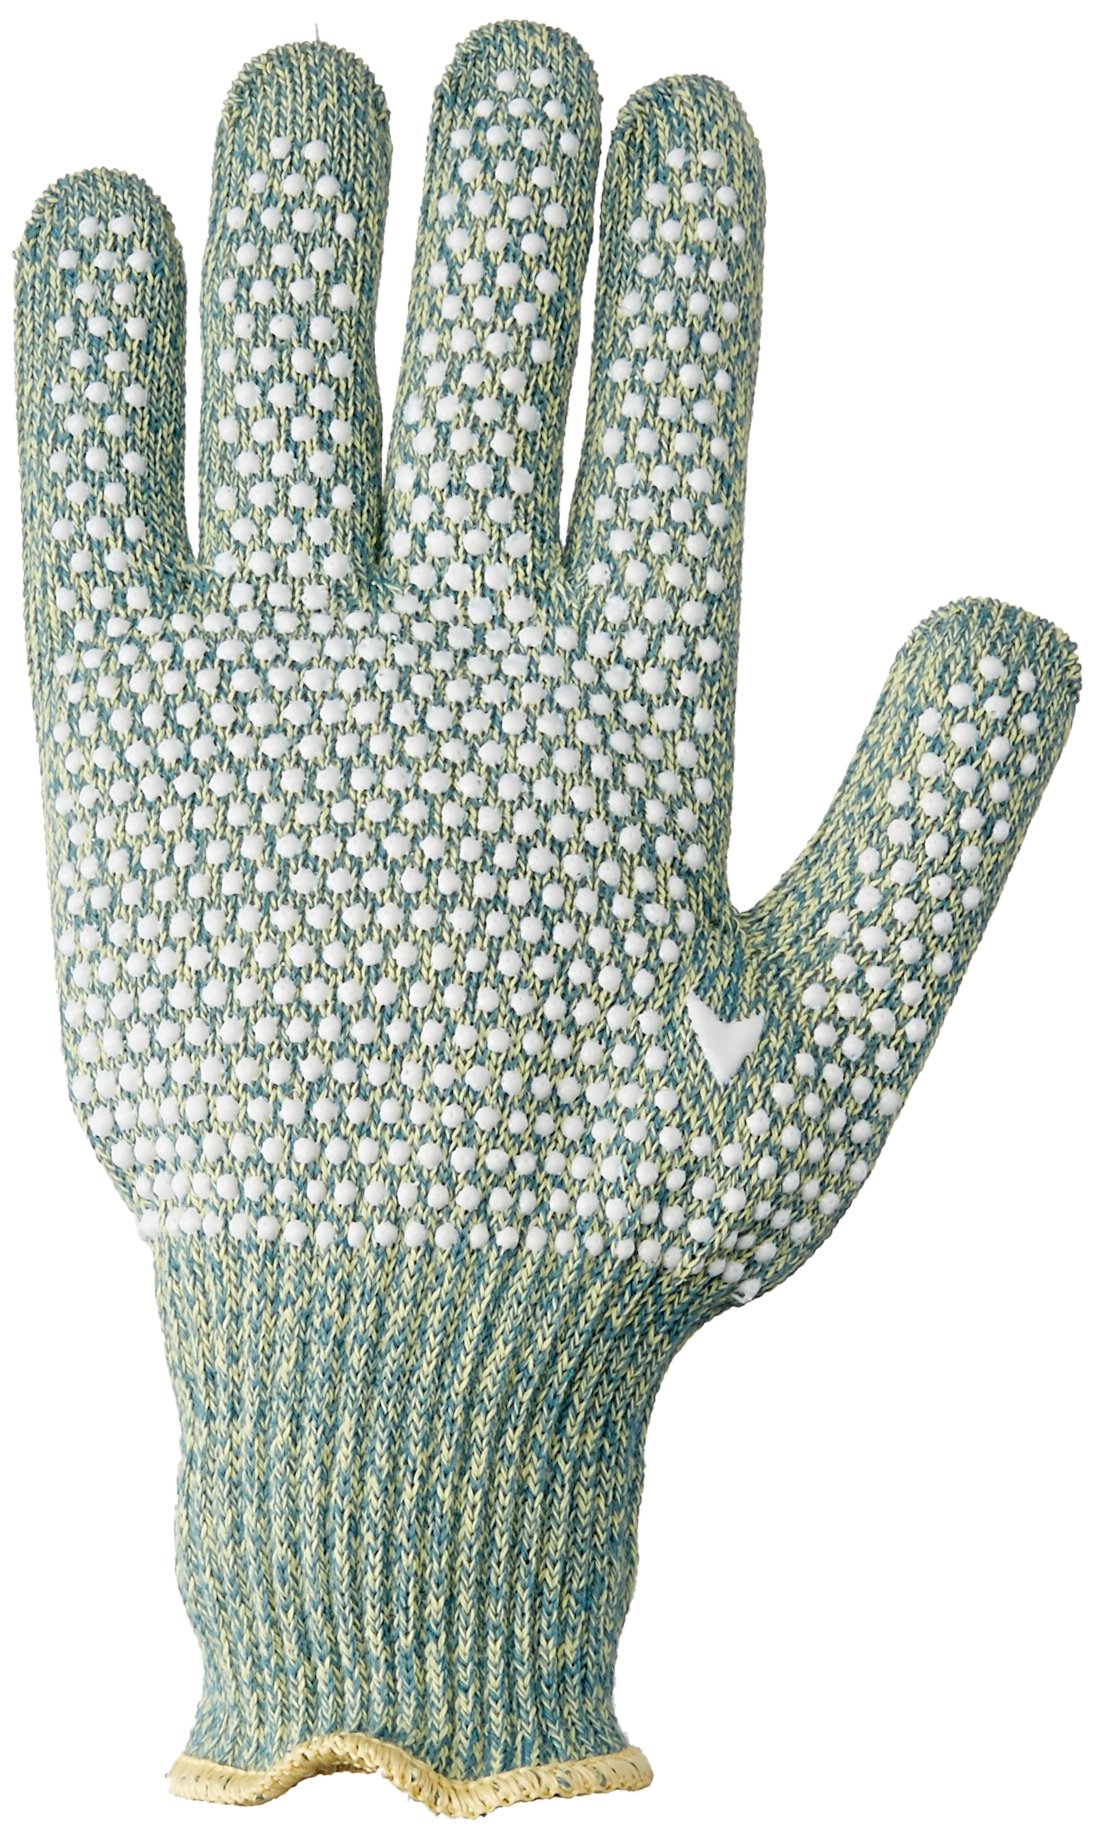 Fons and Porter Klutz Glove, Medium (7858)